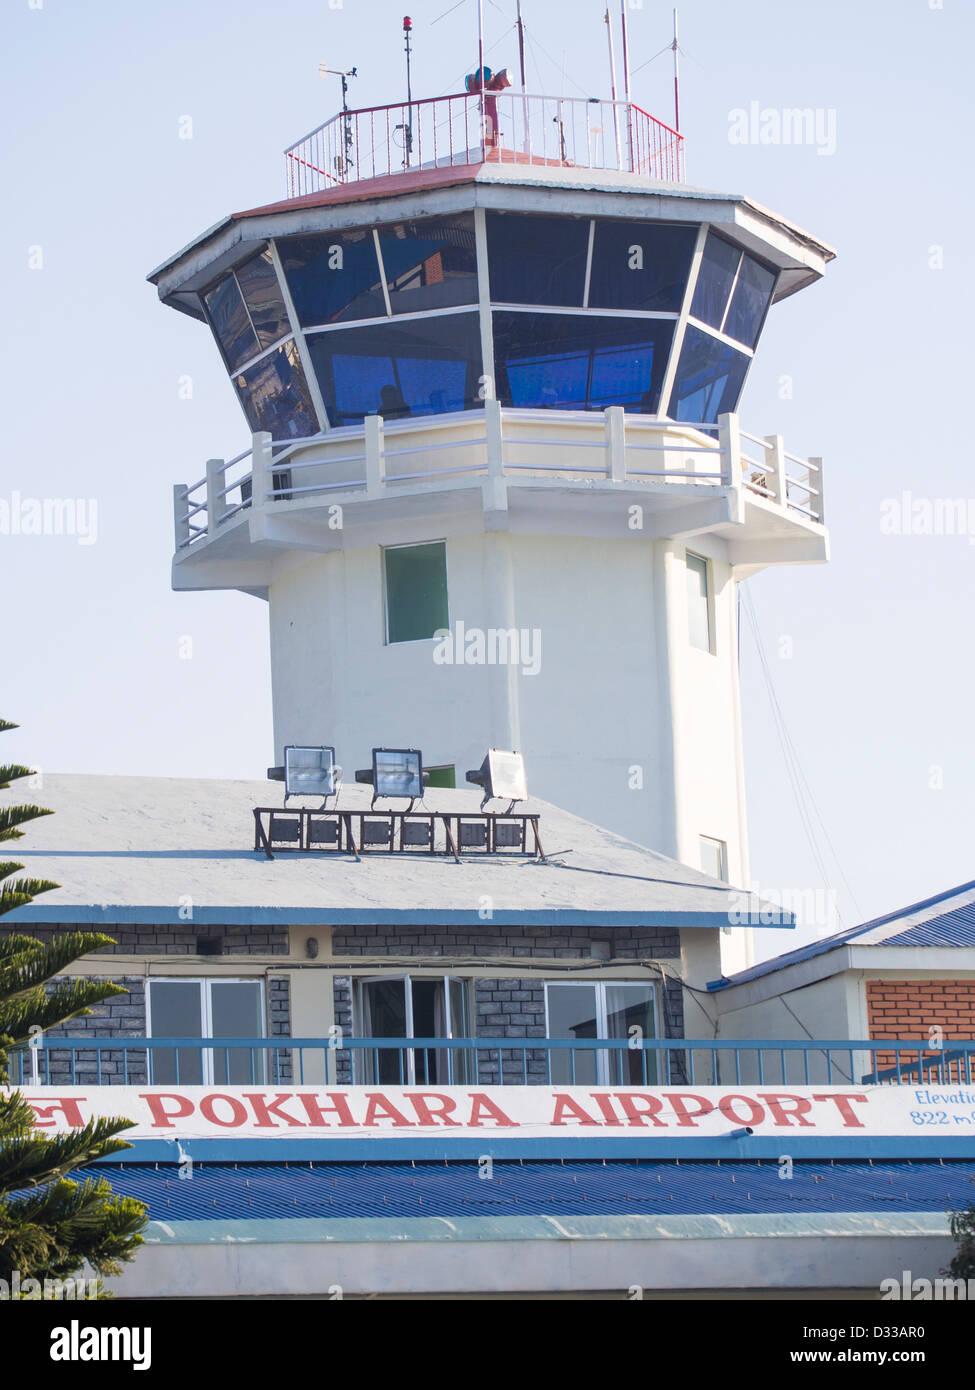 Pokhara airport, Nepal - Stock Image